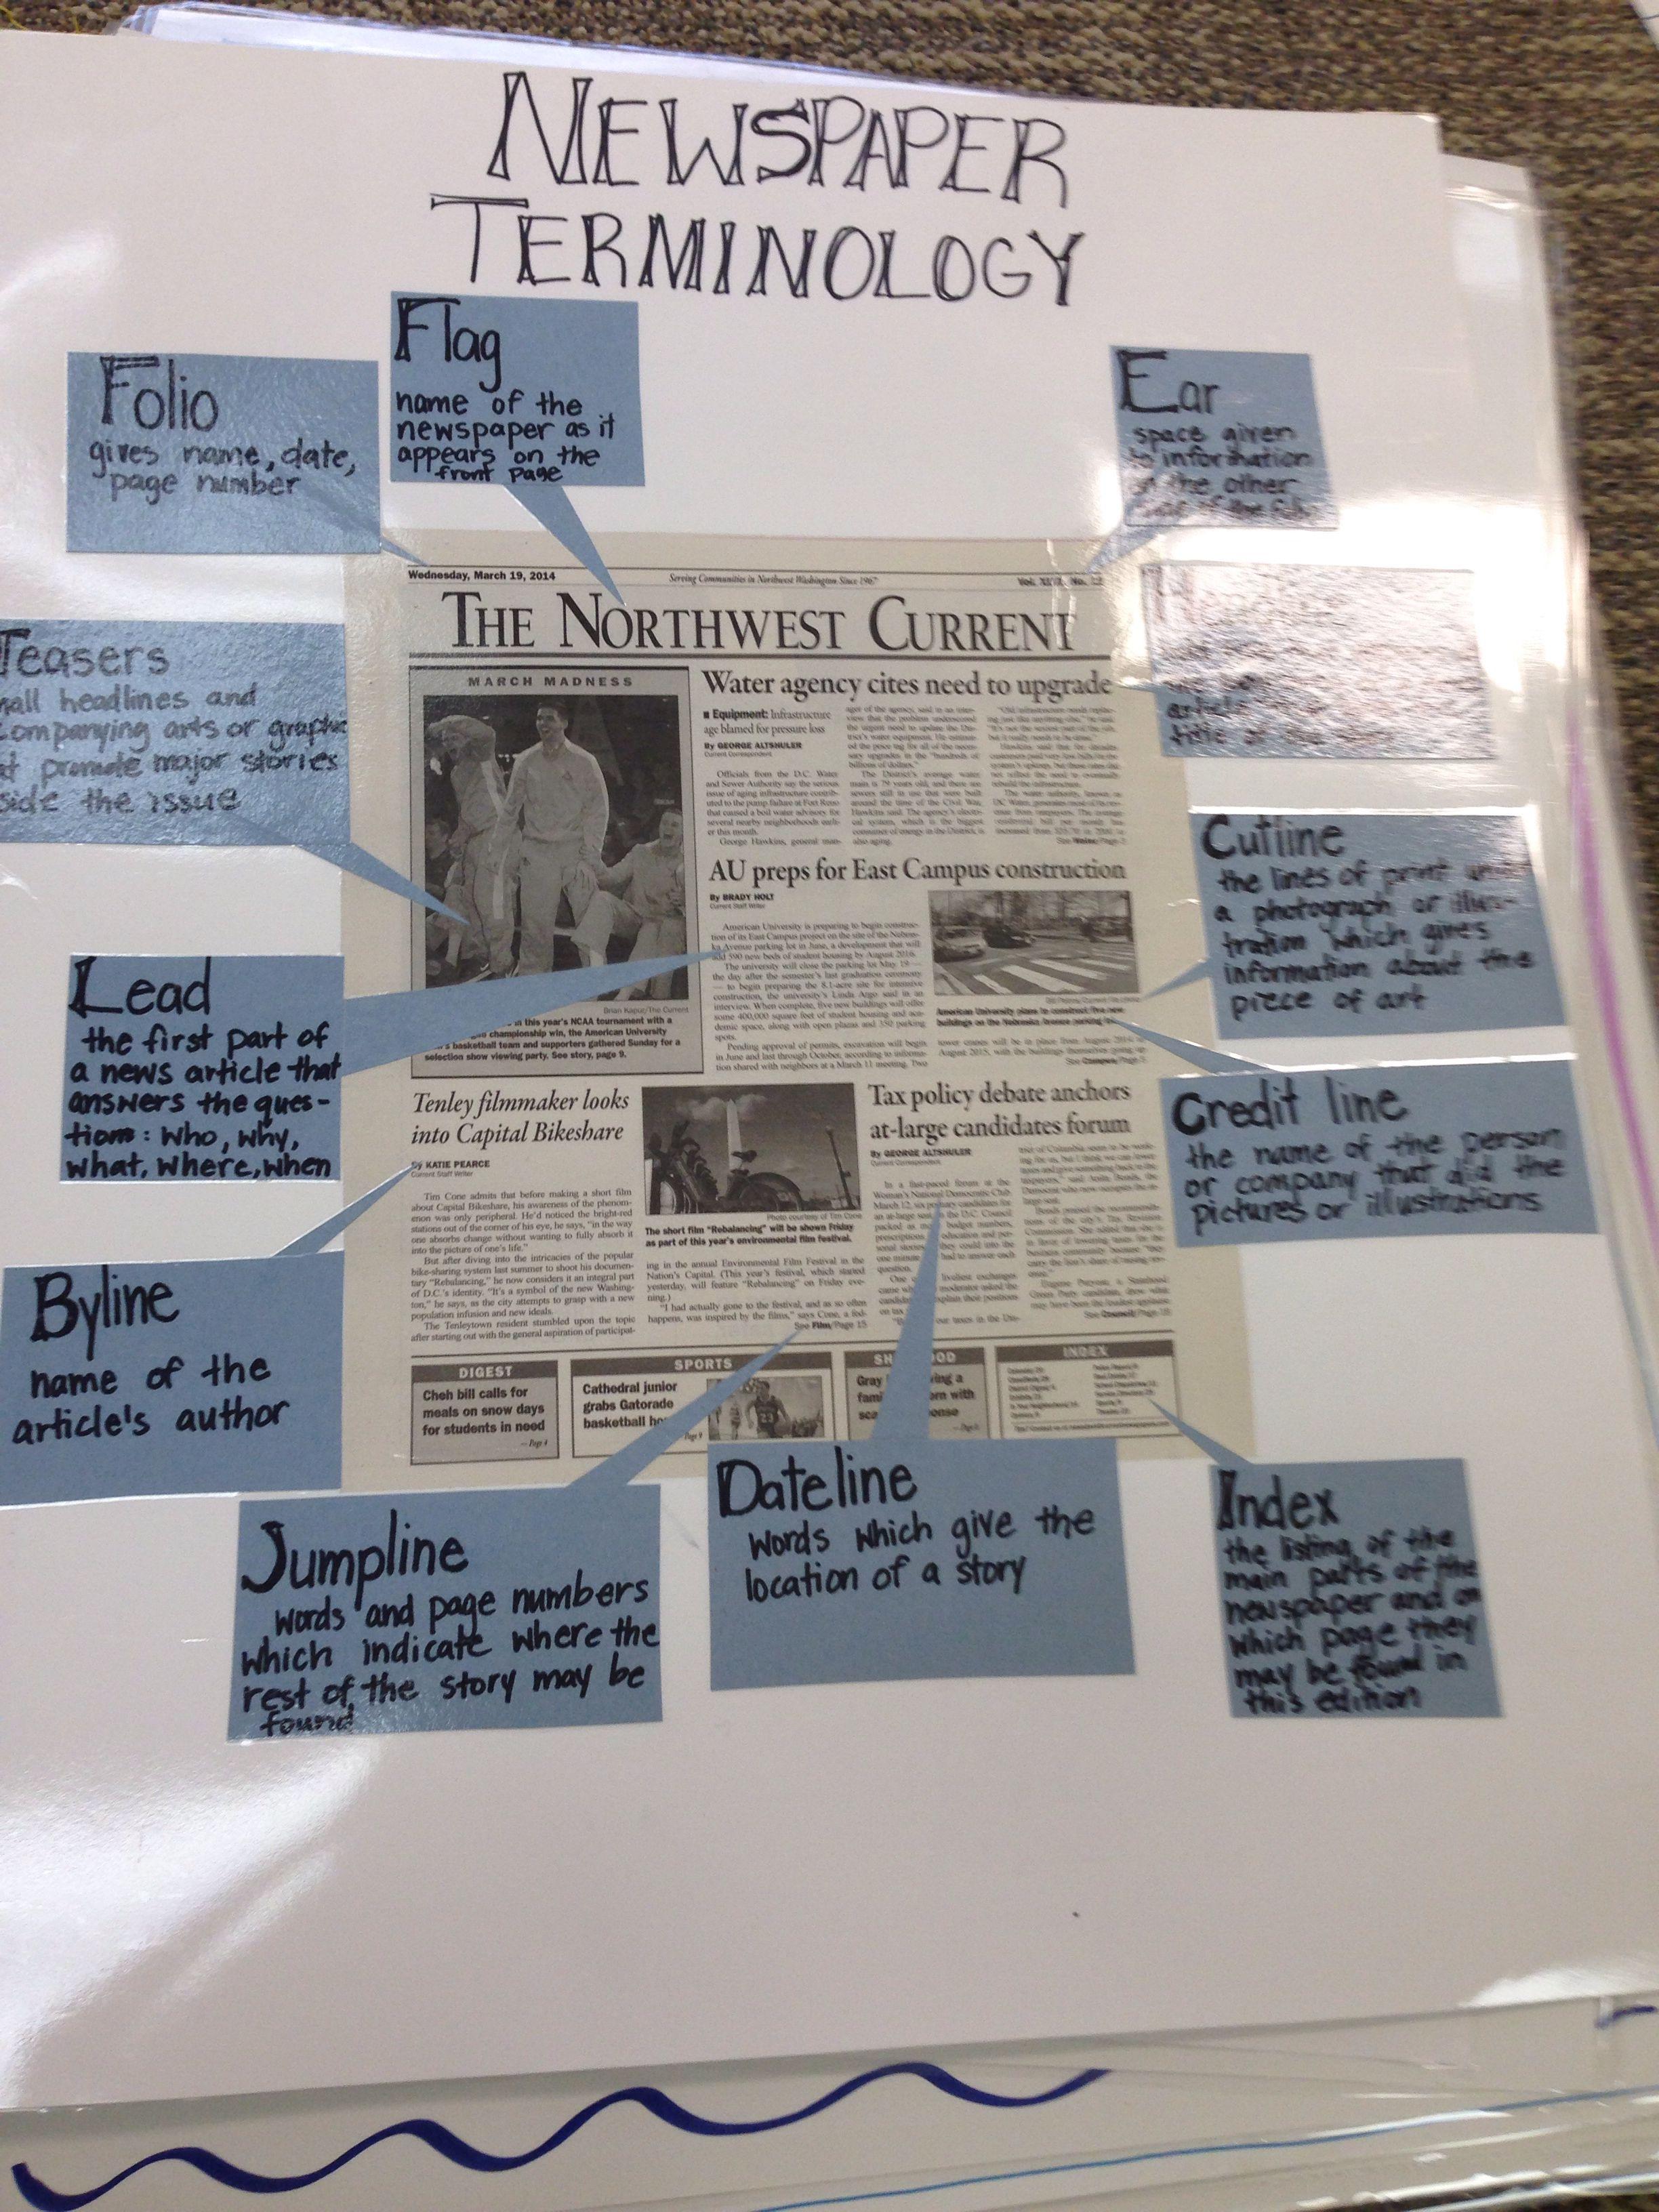 Newspaper Terminology